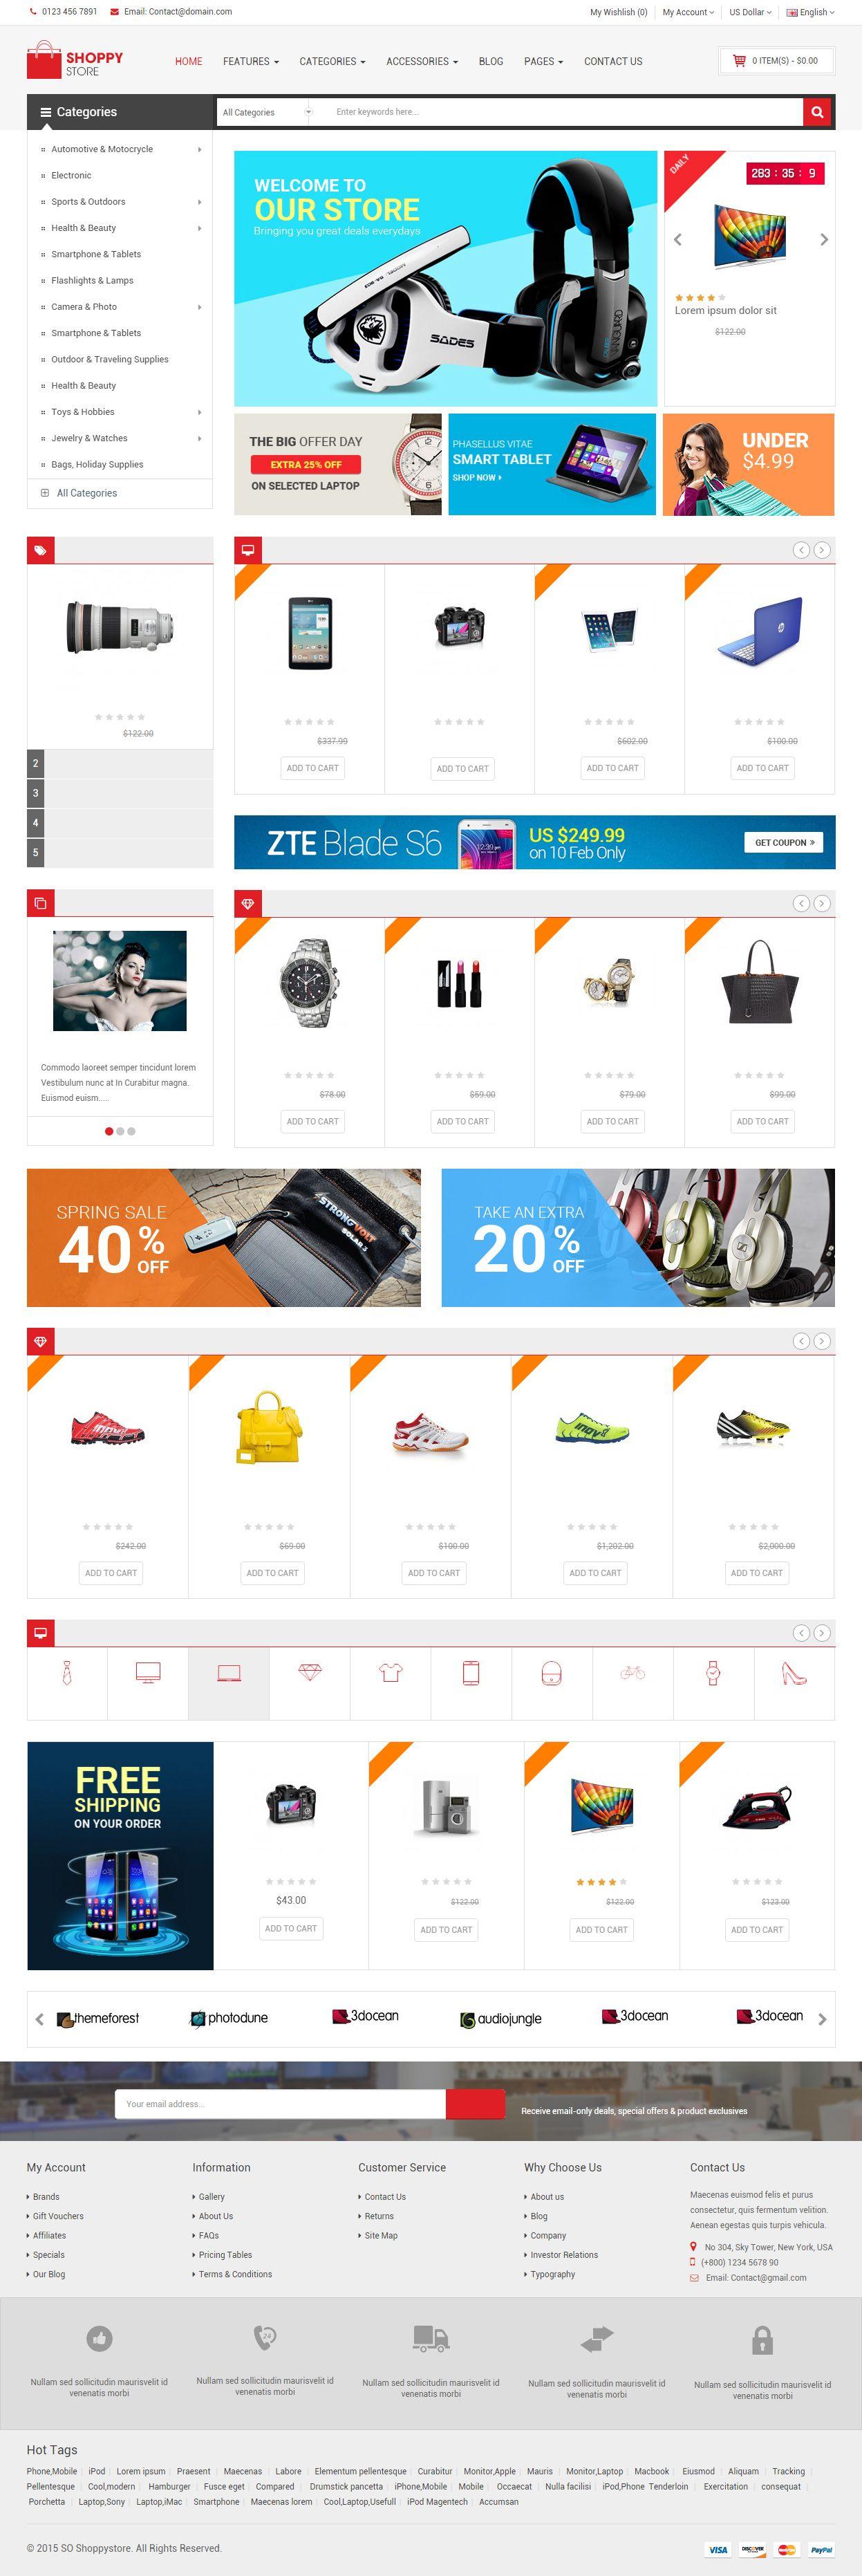 ShoppyStore is Premium full Responsive #OpenCart eCommerce #Theme. #RetinaReady. Bootstrap 3 Framework. Mega Menu. Font Awesome. Test free demo at: http://www.responsivemiracle.com/shoppystore-premium-responsive-multipurpose-opencart-theme/